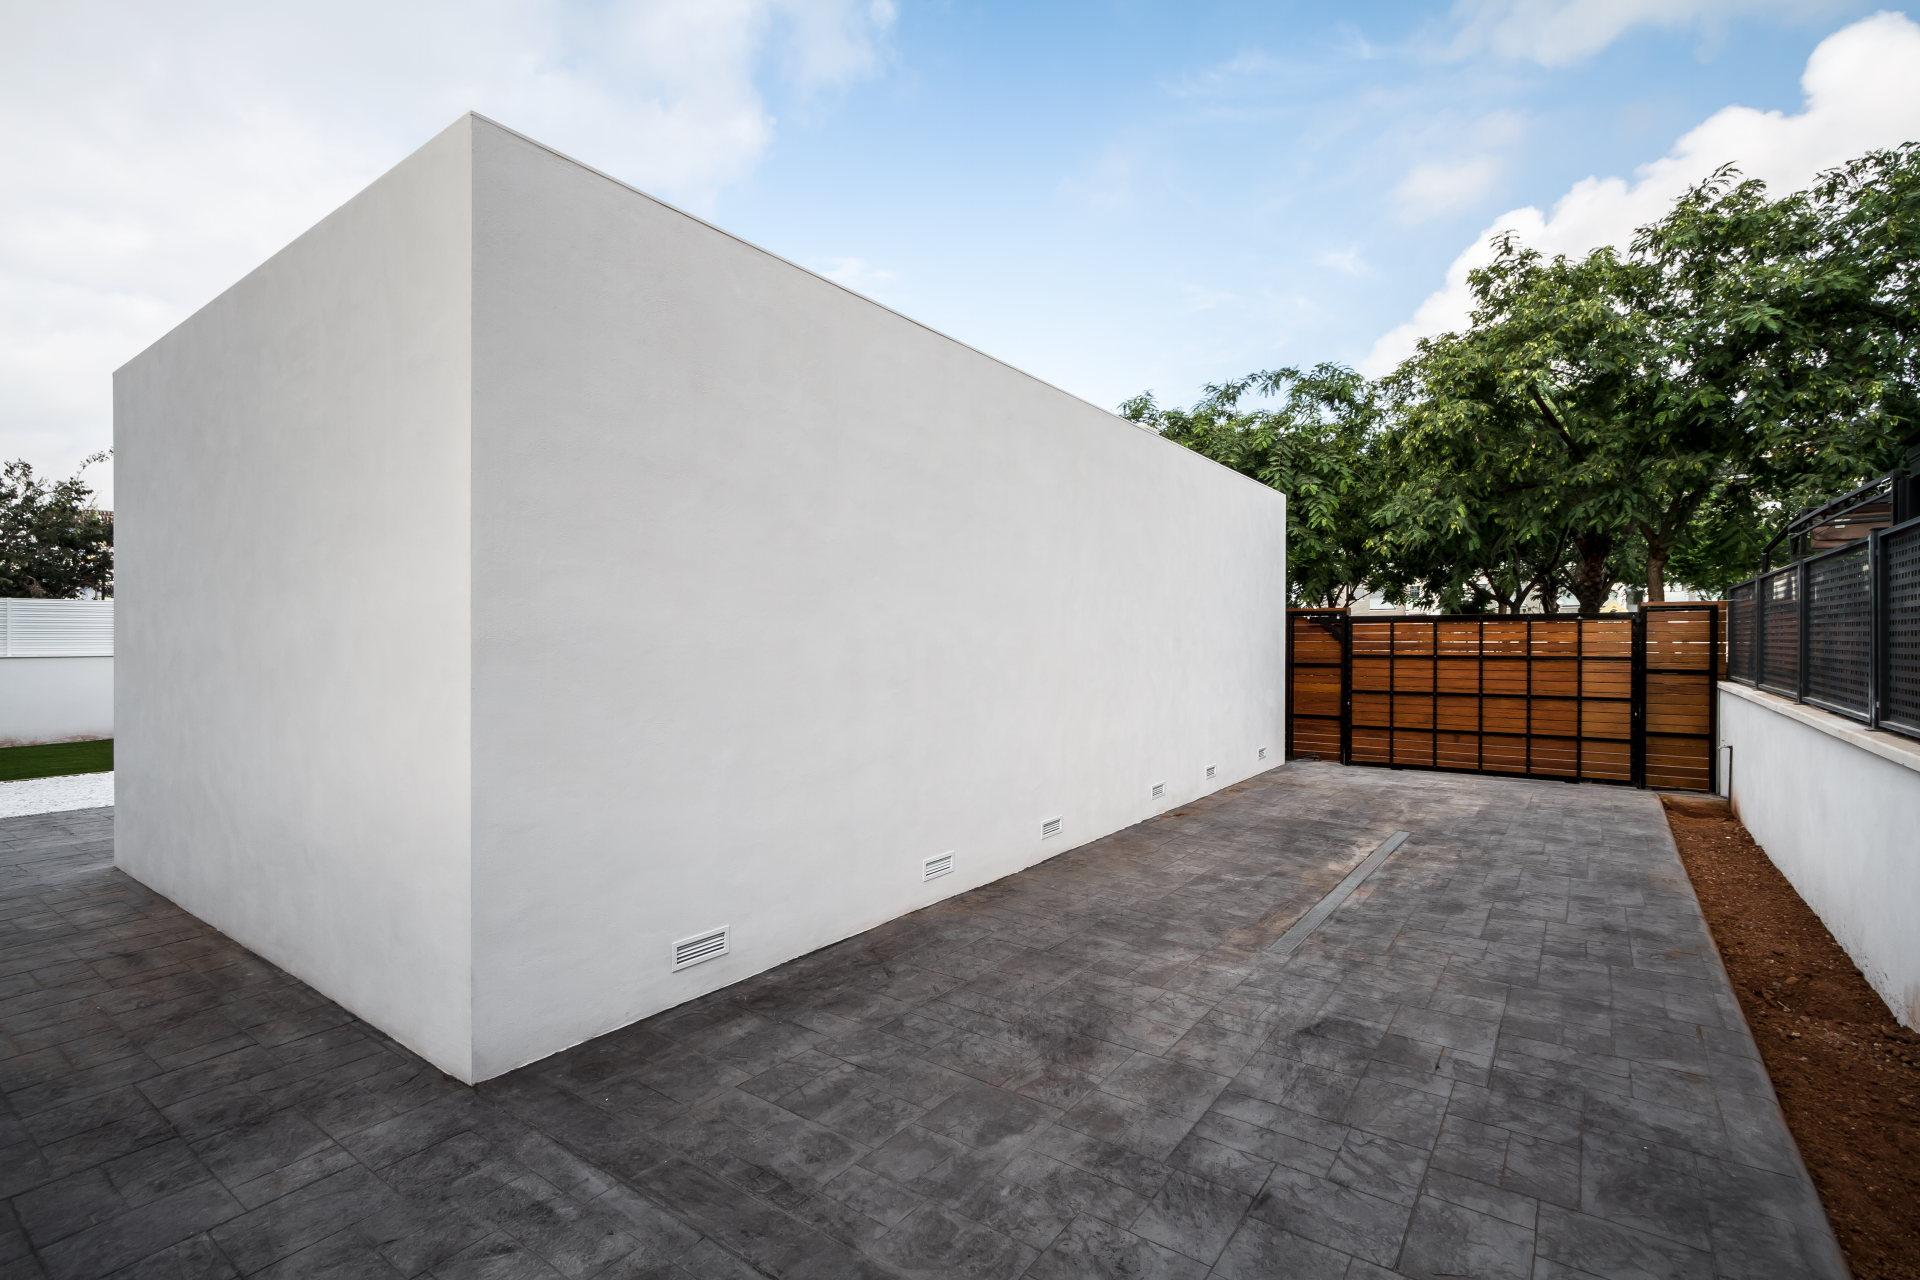 fotografia-arquitectura-valencia-german-cabo-viraje-museros (25)